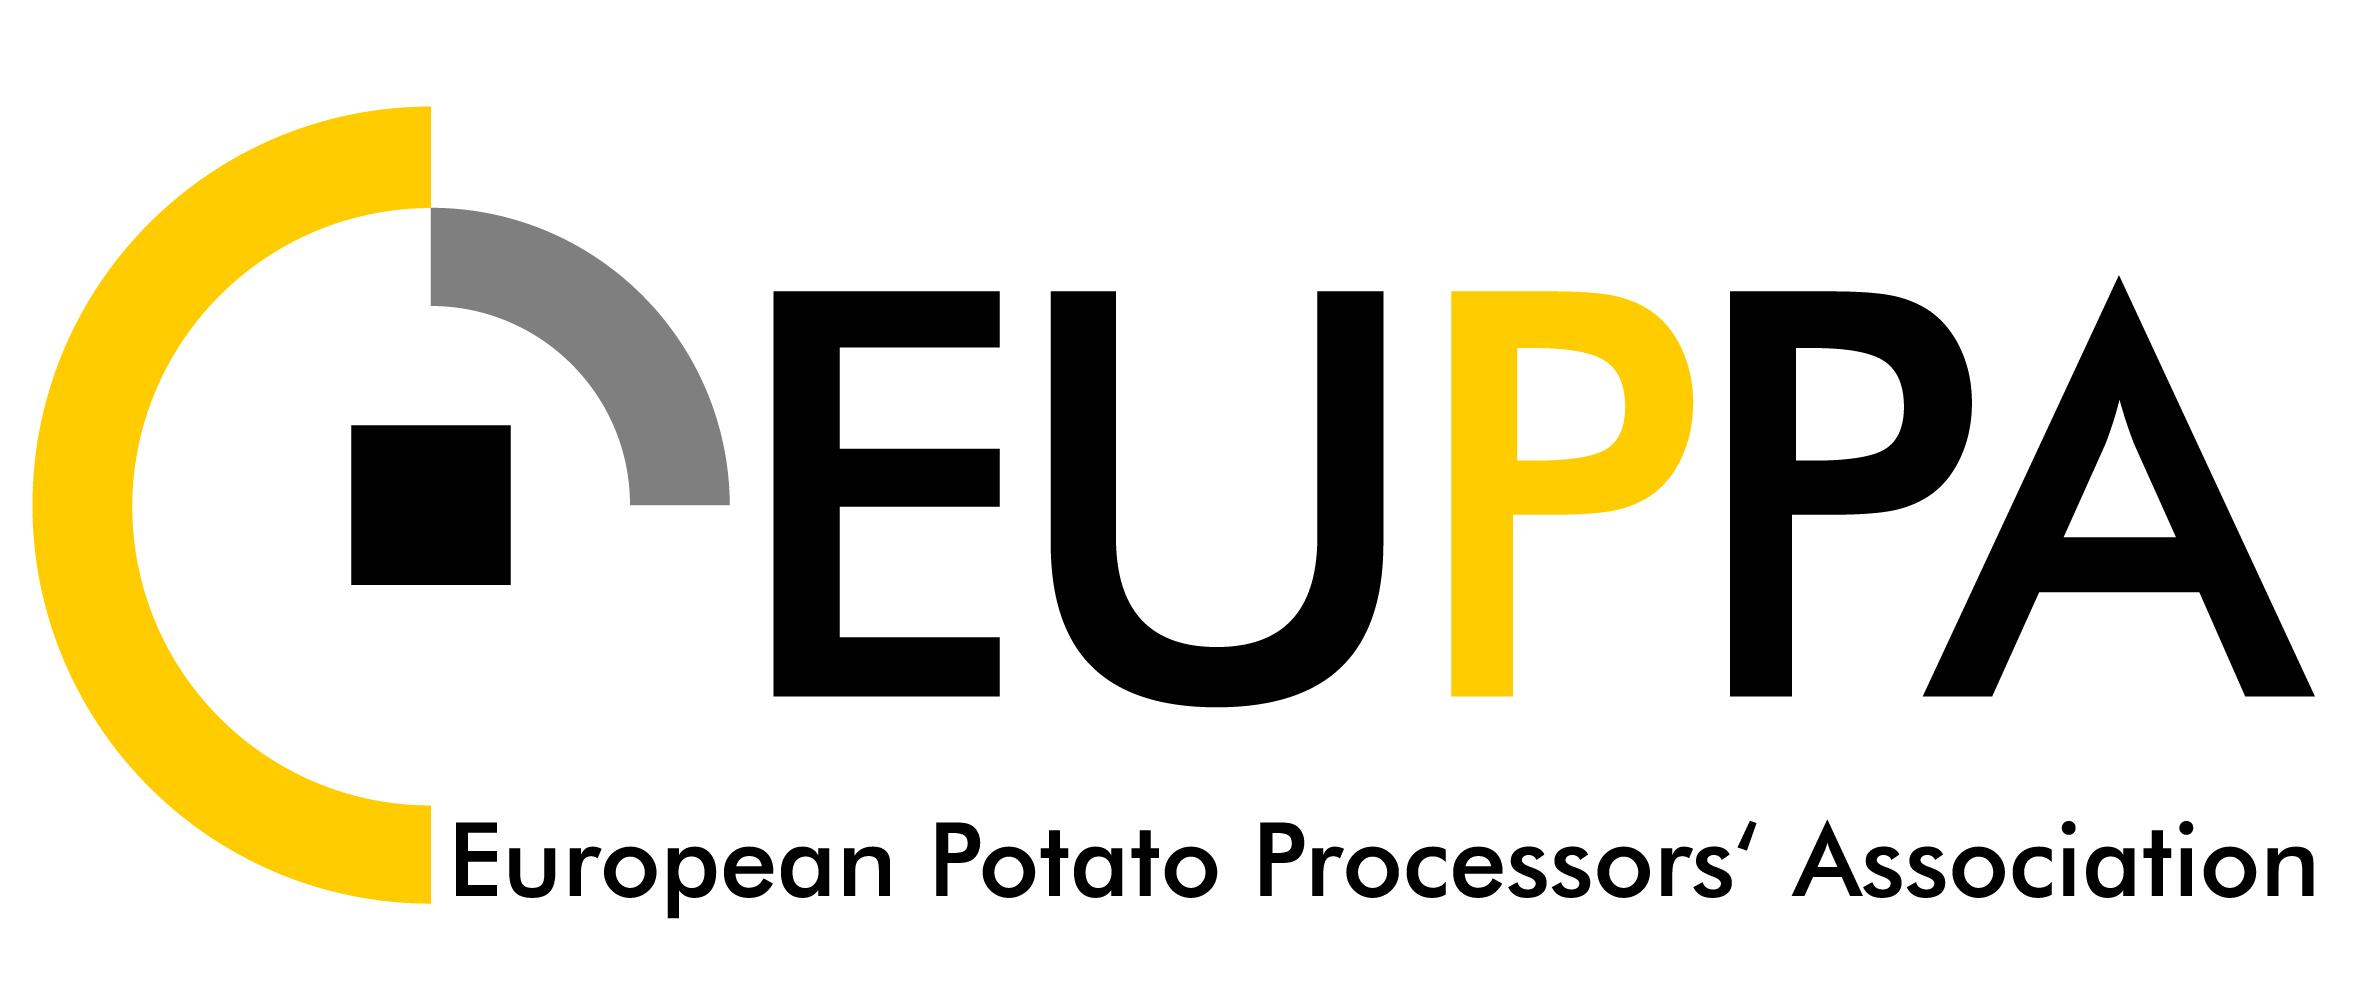 logo for EUPPA - European Potato Processors' Association